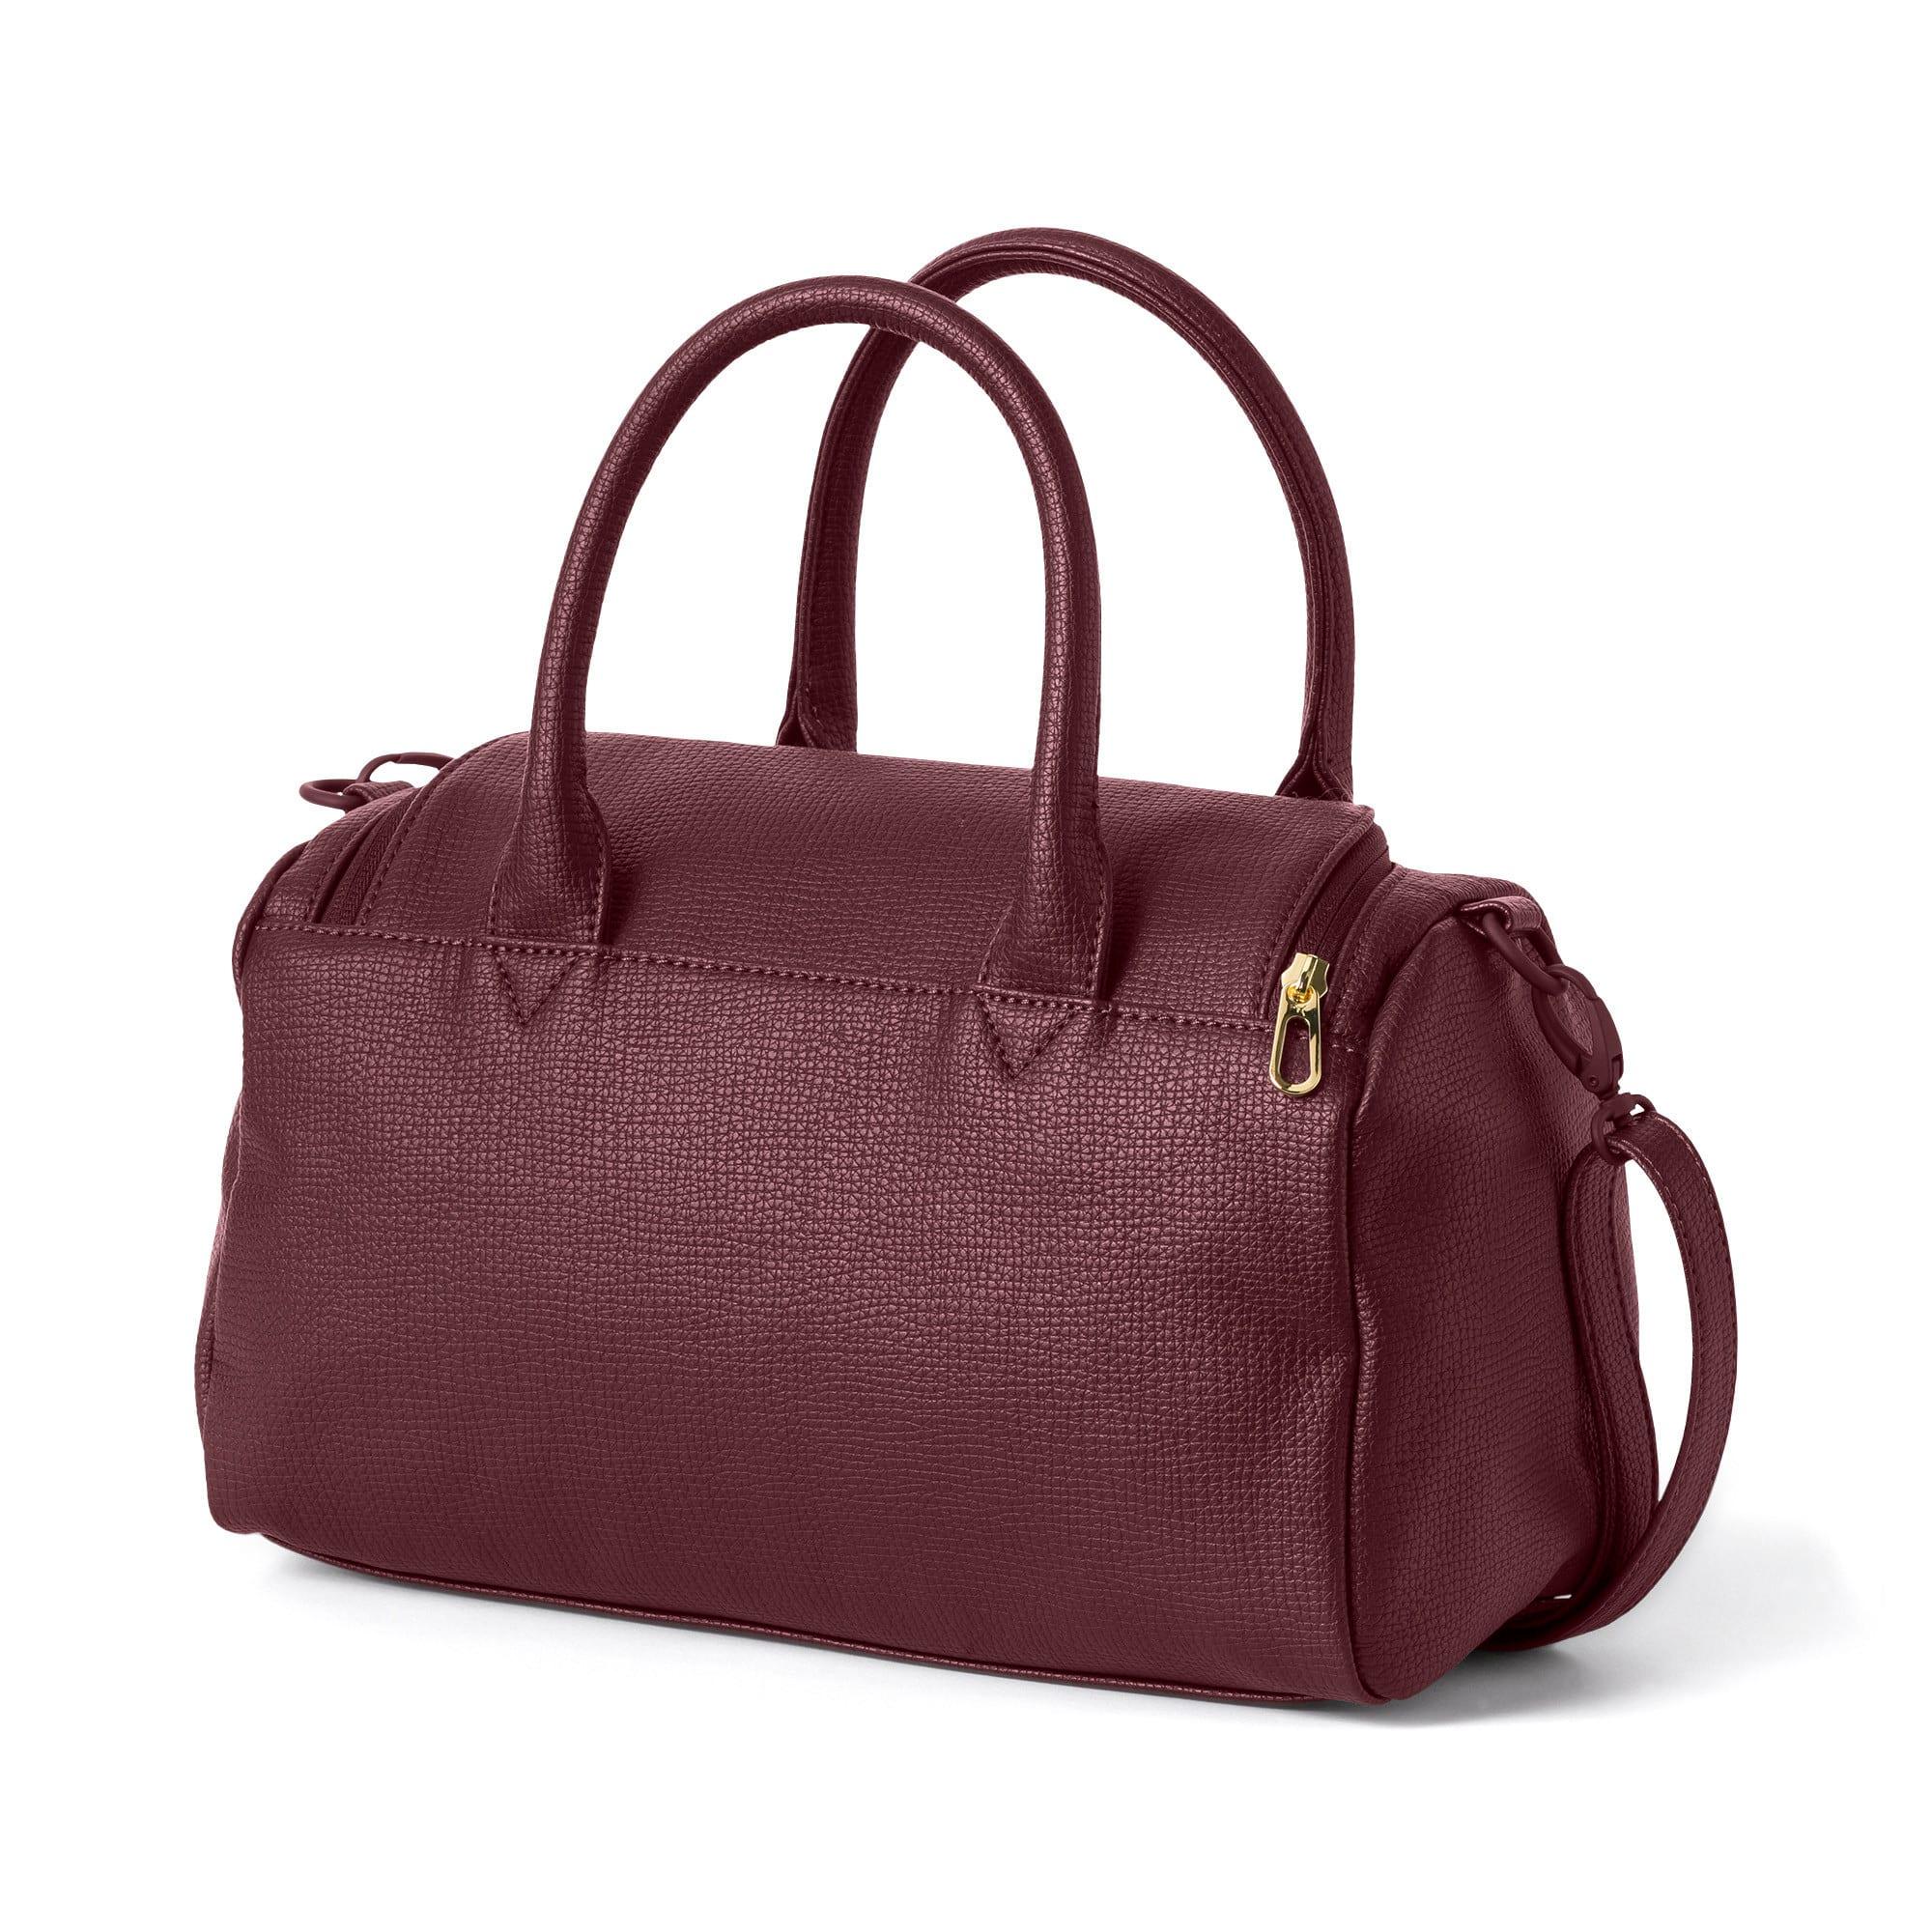 Thumbnail 3 of Ferrari Lifestyle Women's Handbag, Vineyard Wine, medium-IND